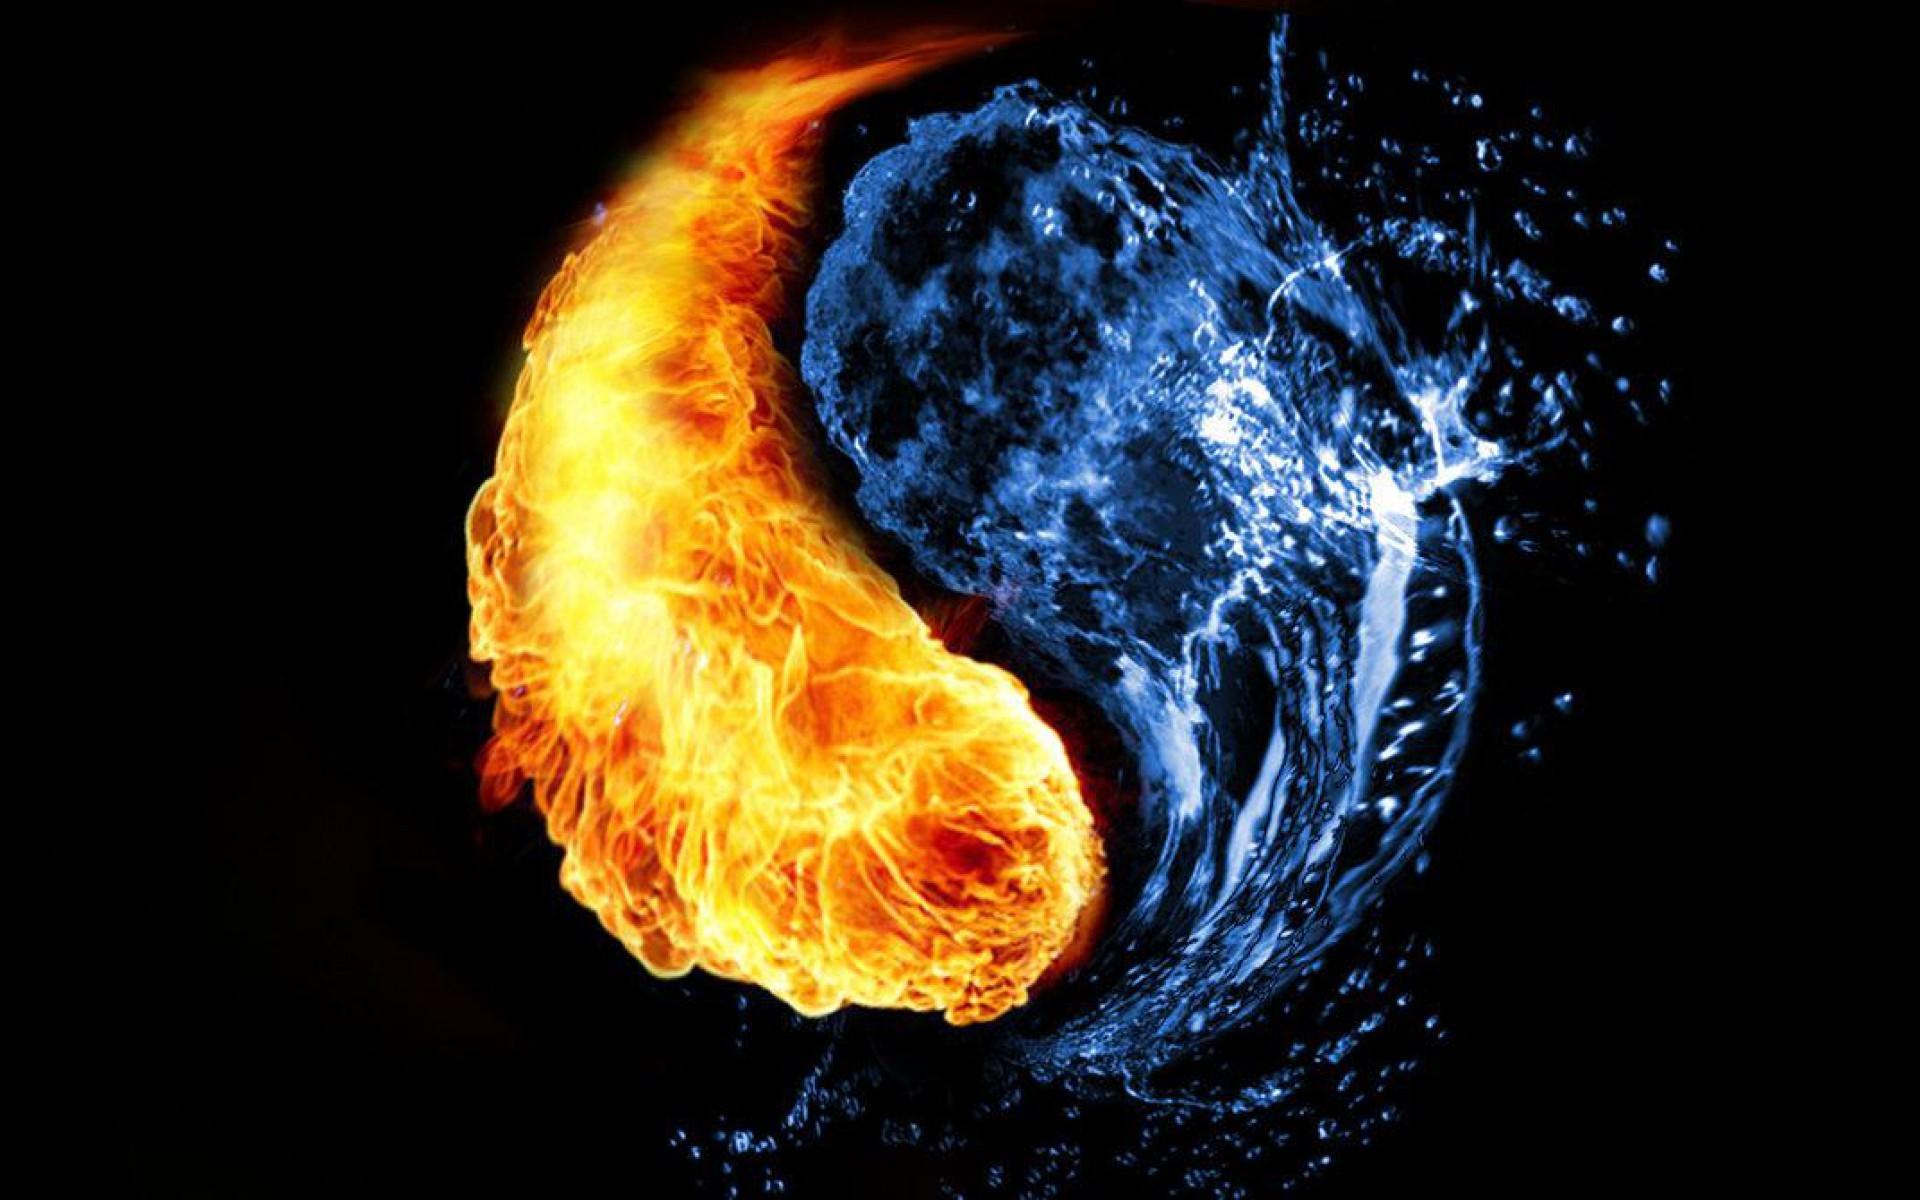 1920x1200 Fire And Ice Yin Yang